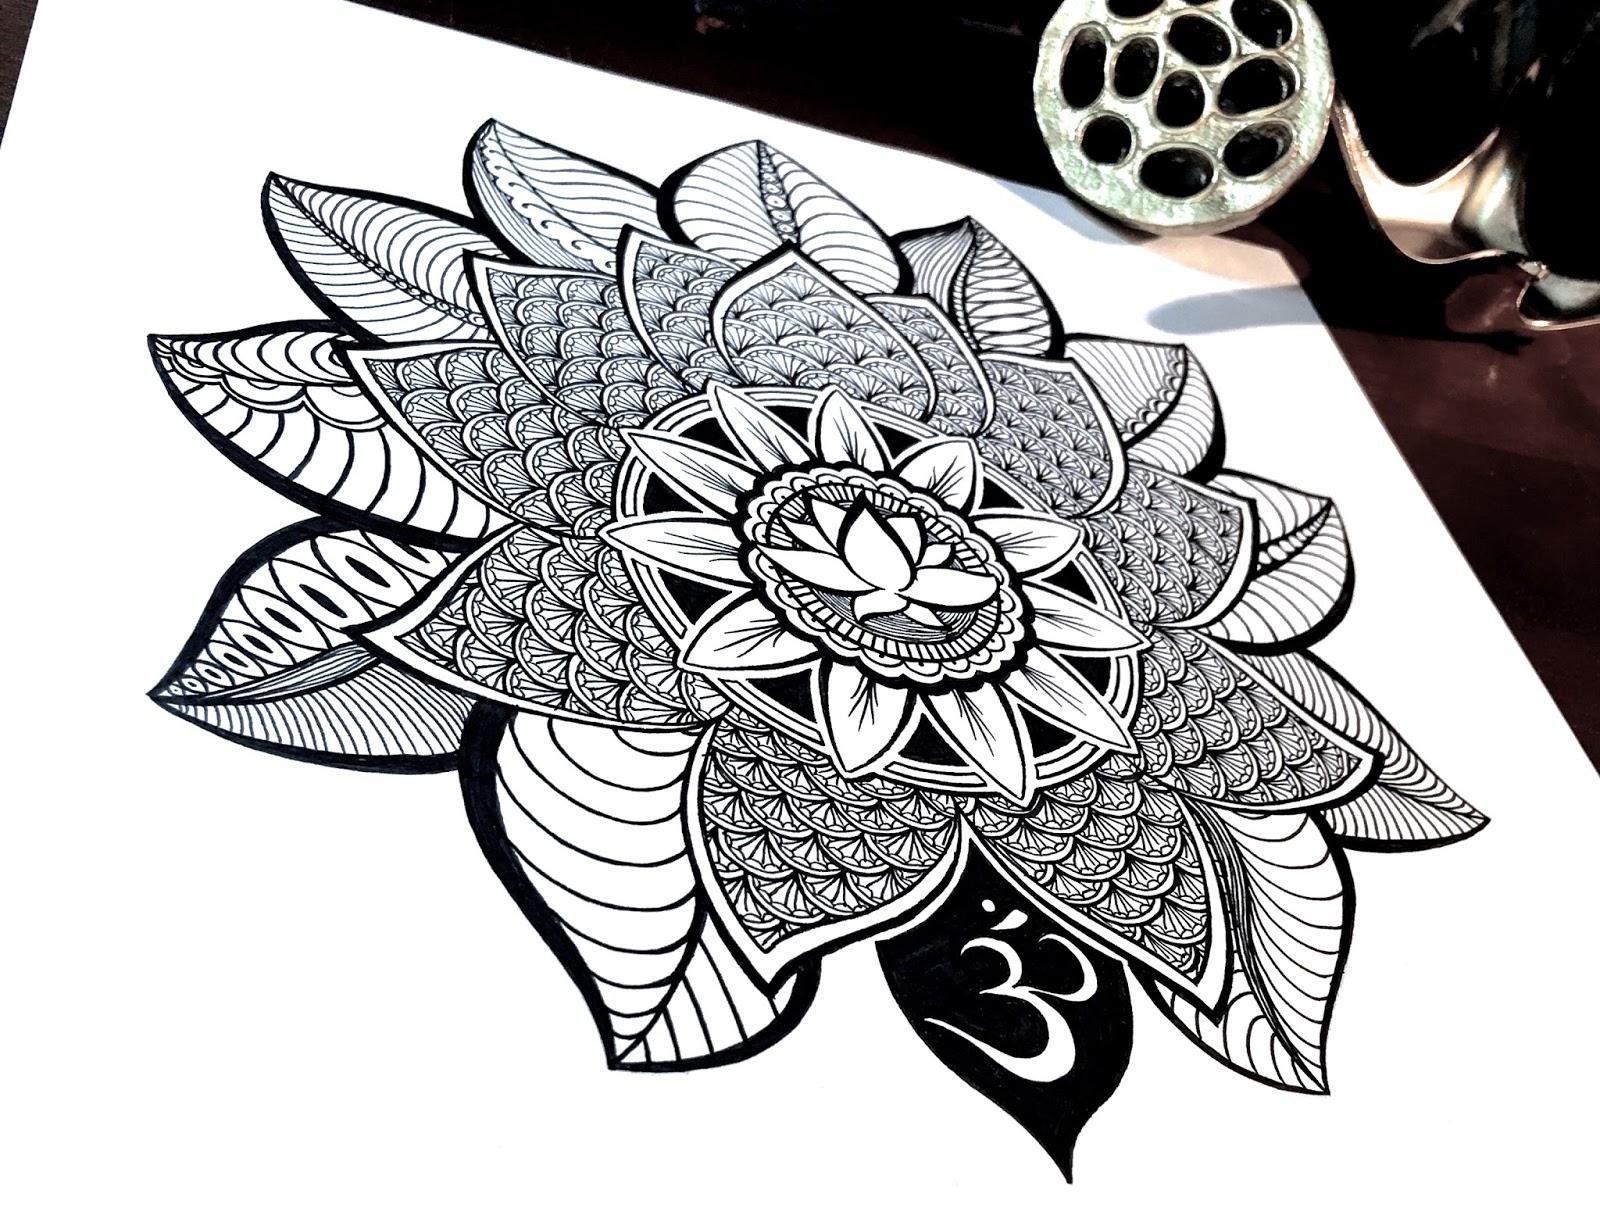 Line Art Flower Design : Time lapse drawing lotus flower mandala always choose the